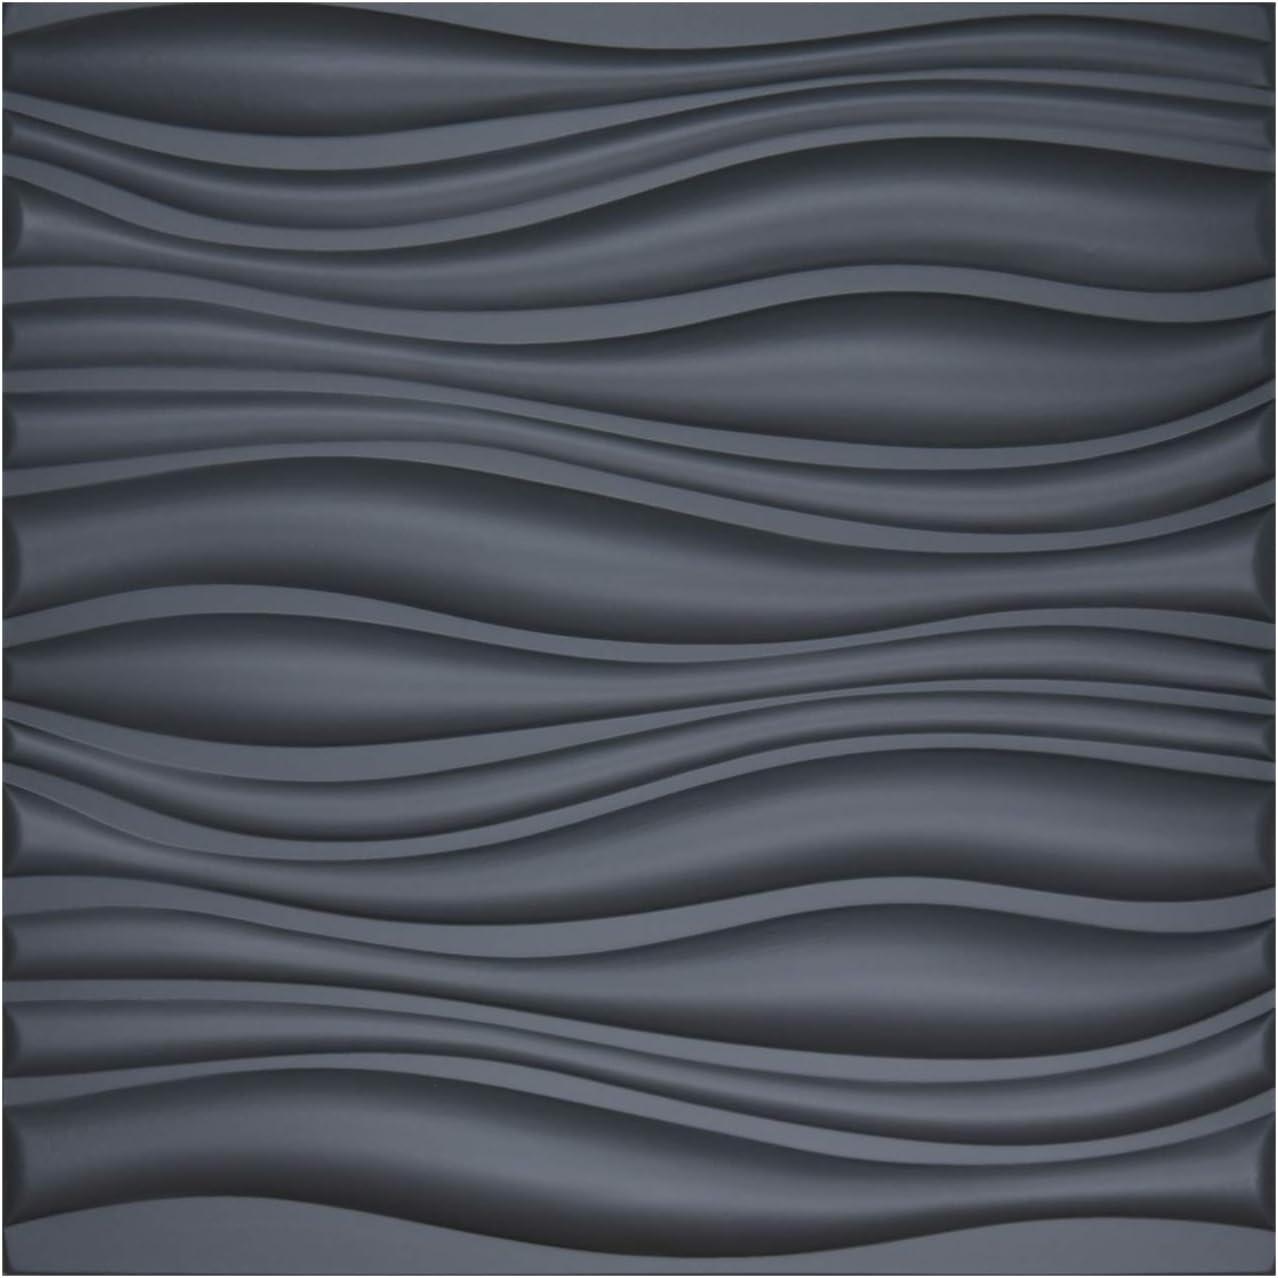 Art3d 3D Leather Tiles Decoartive 3D Wall Panels, Black Wave 23.6